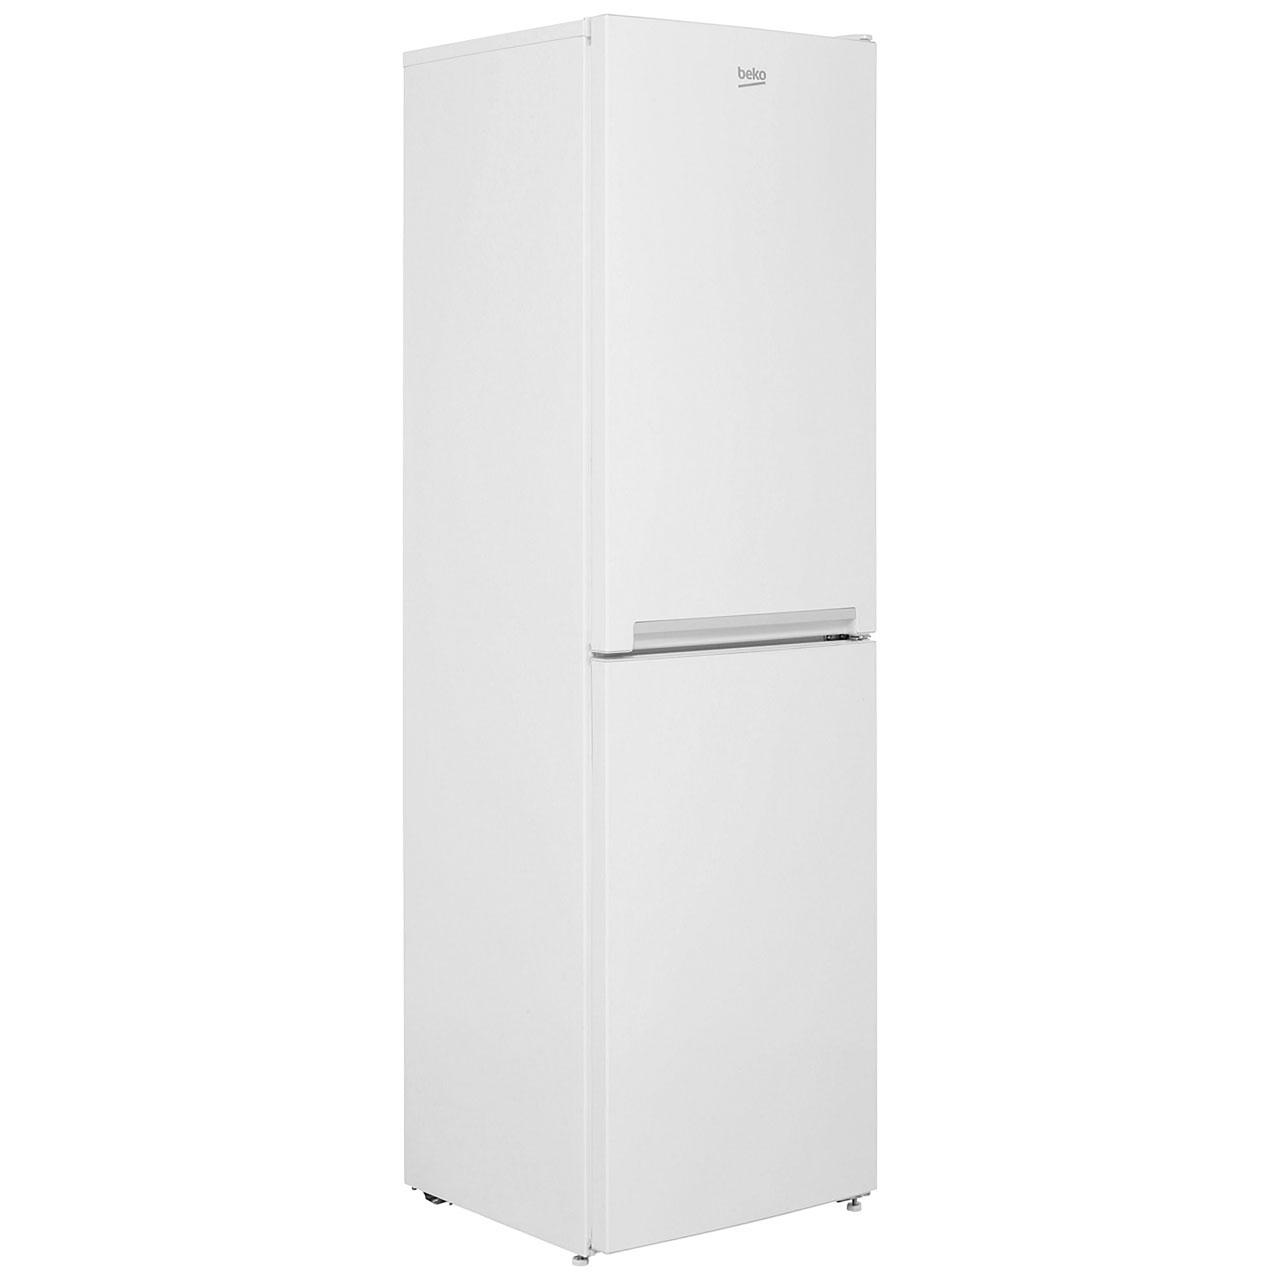 Beko Crfg1582w Fridge Freezer Appliance Spotter